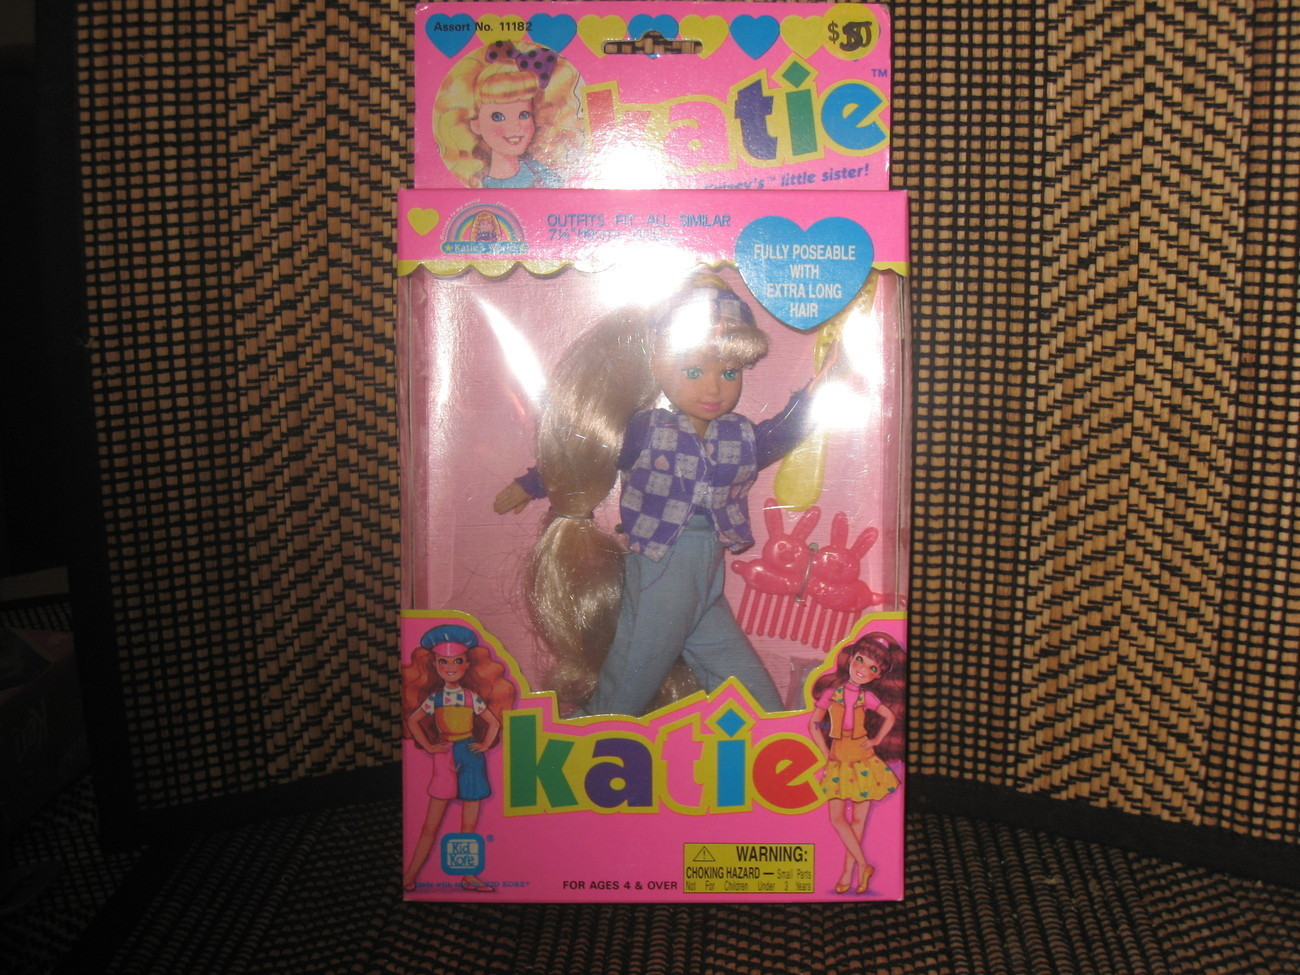 Katie, Kelsey's Little Sister, by Kid Kore, 1994